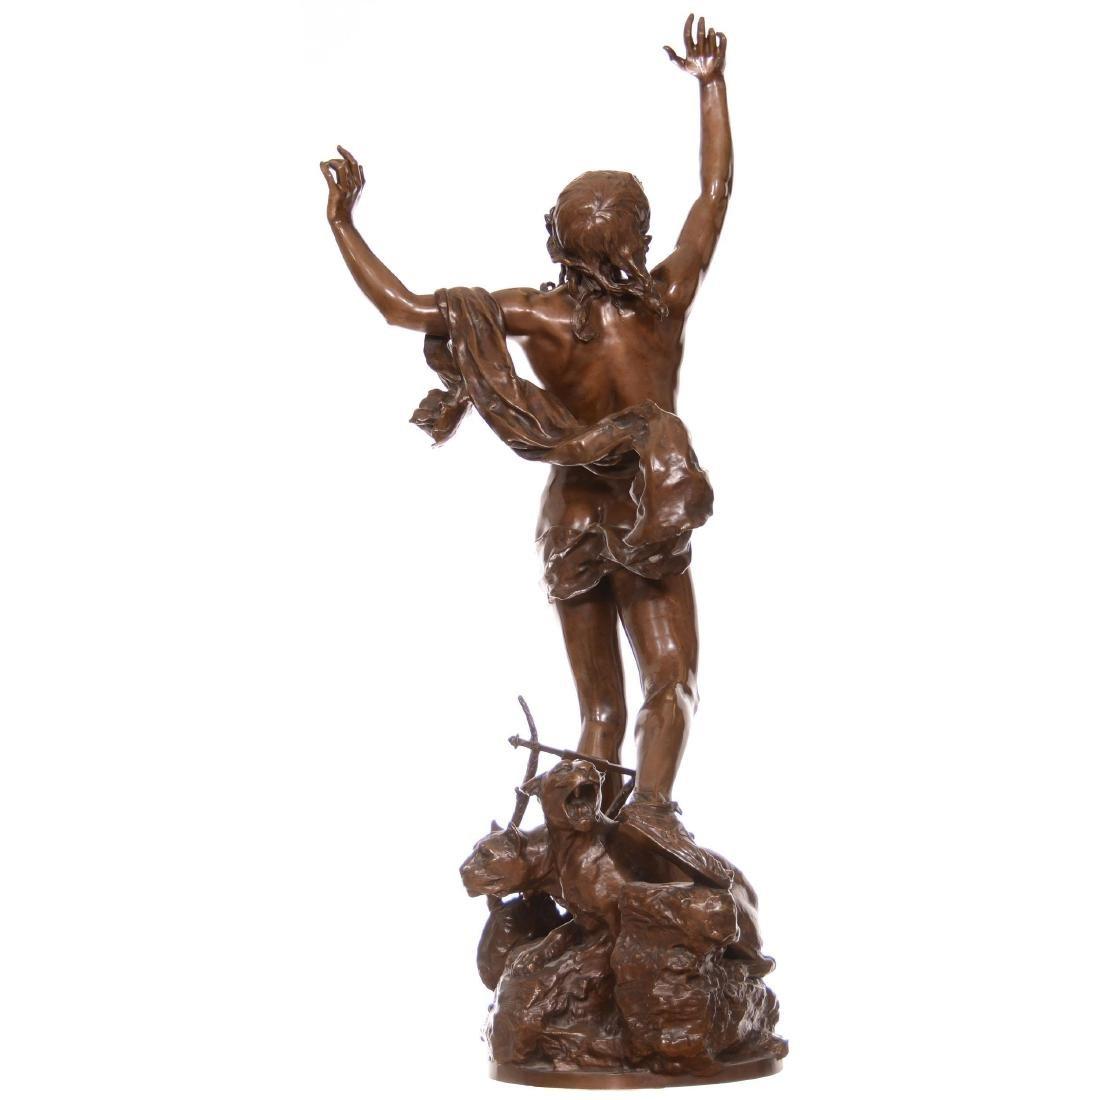 Original Bronze Statue - 4